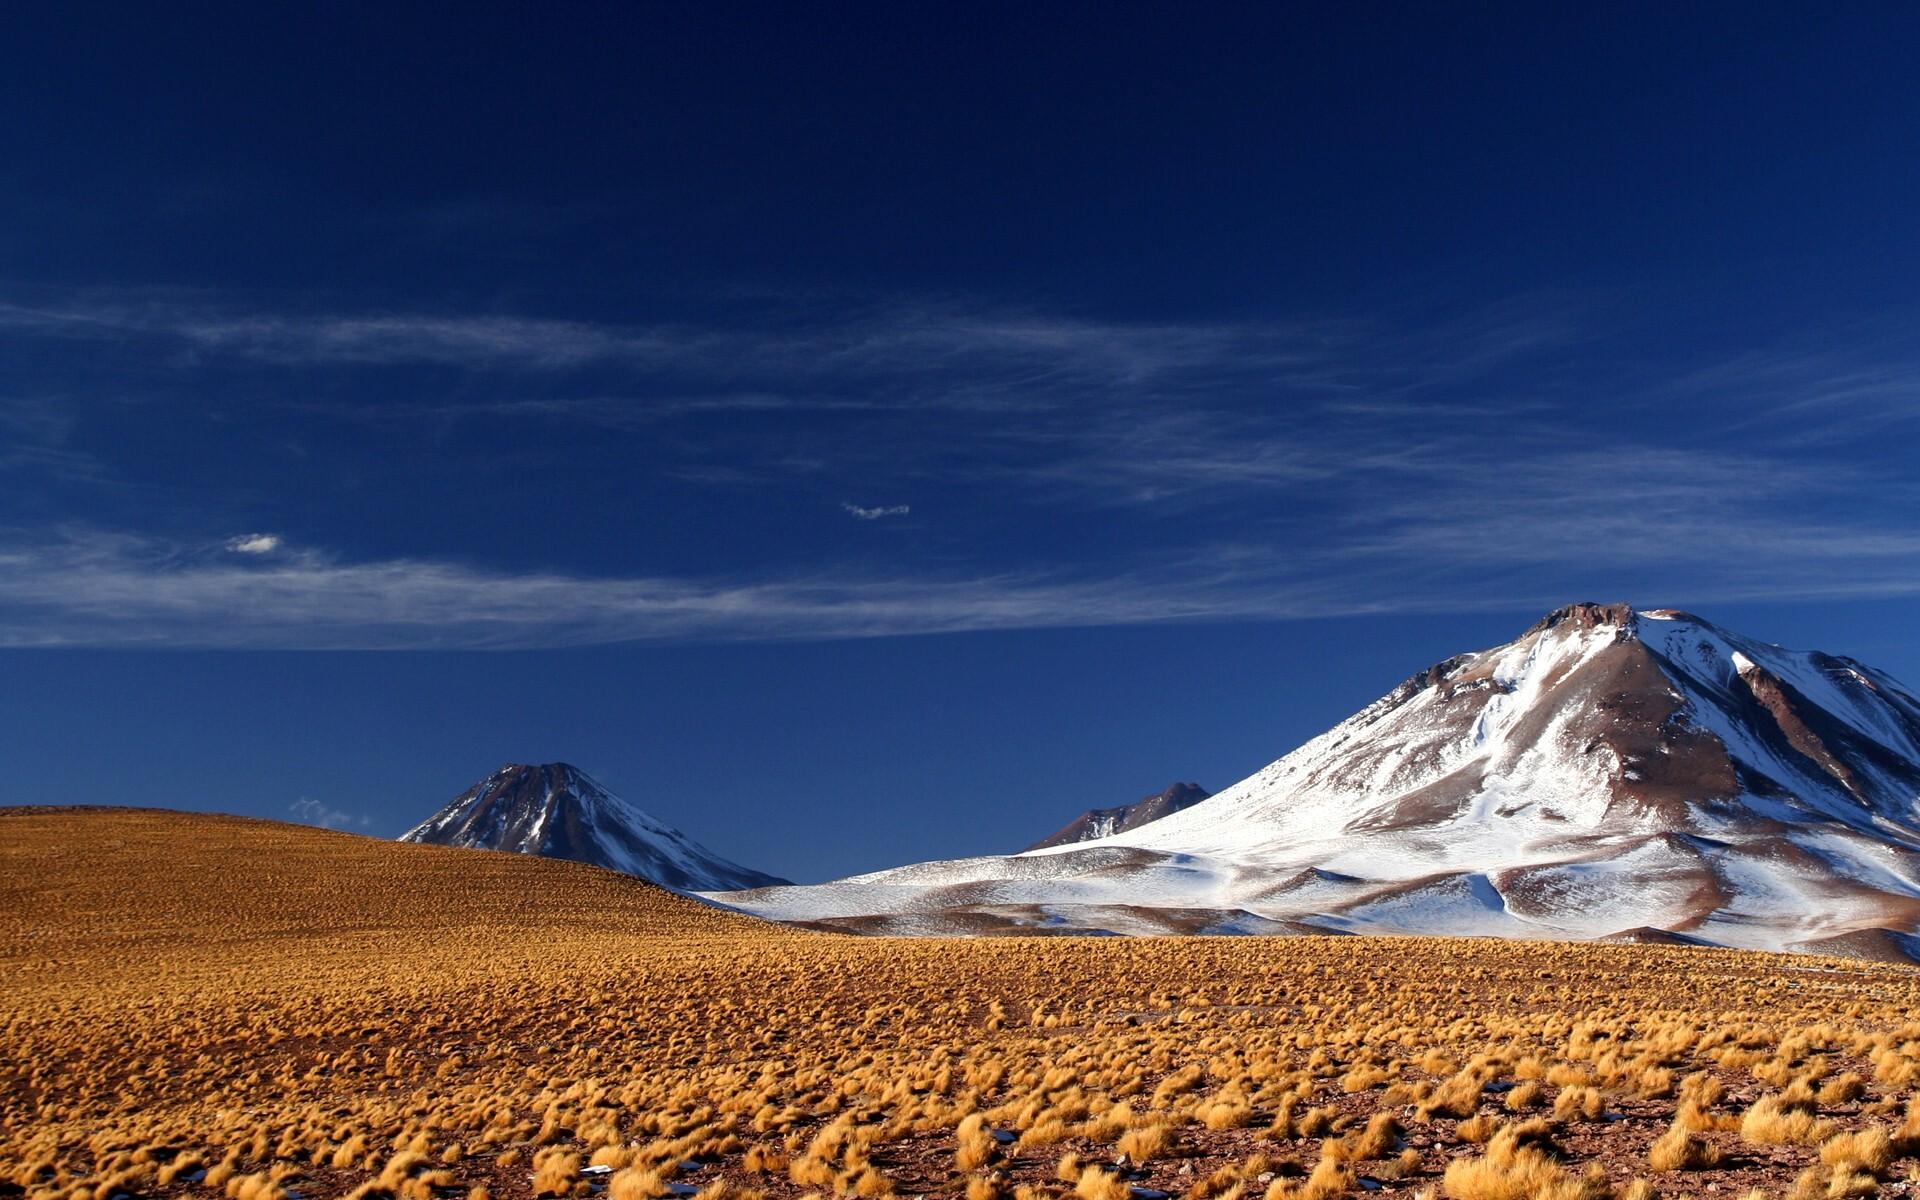 Patagonia photo spots | Patagonia photo guide